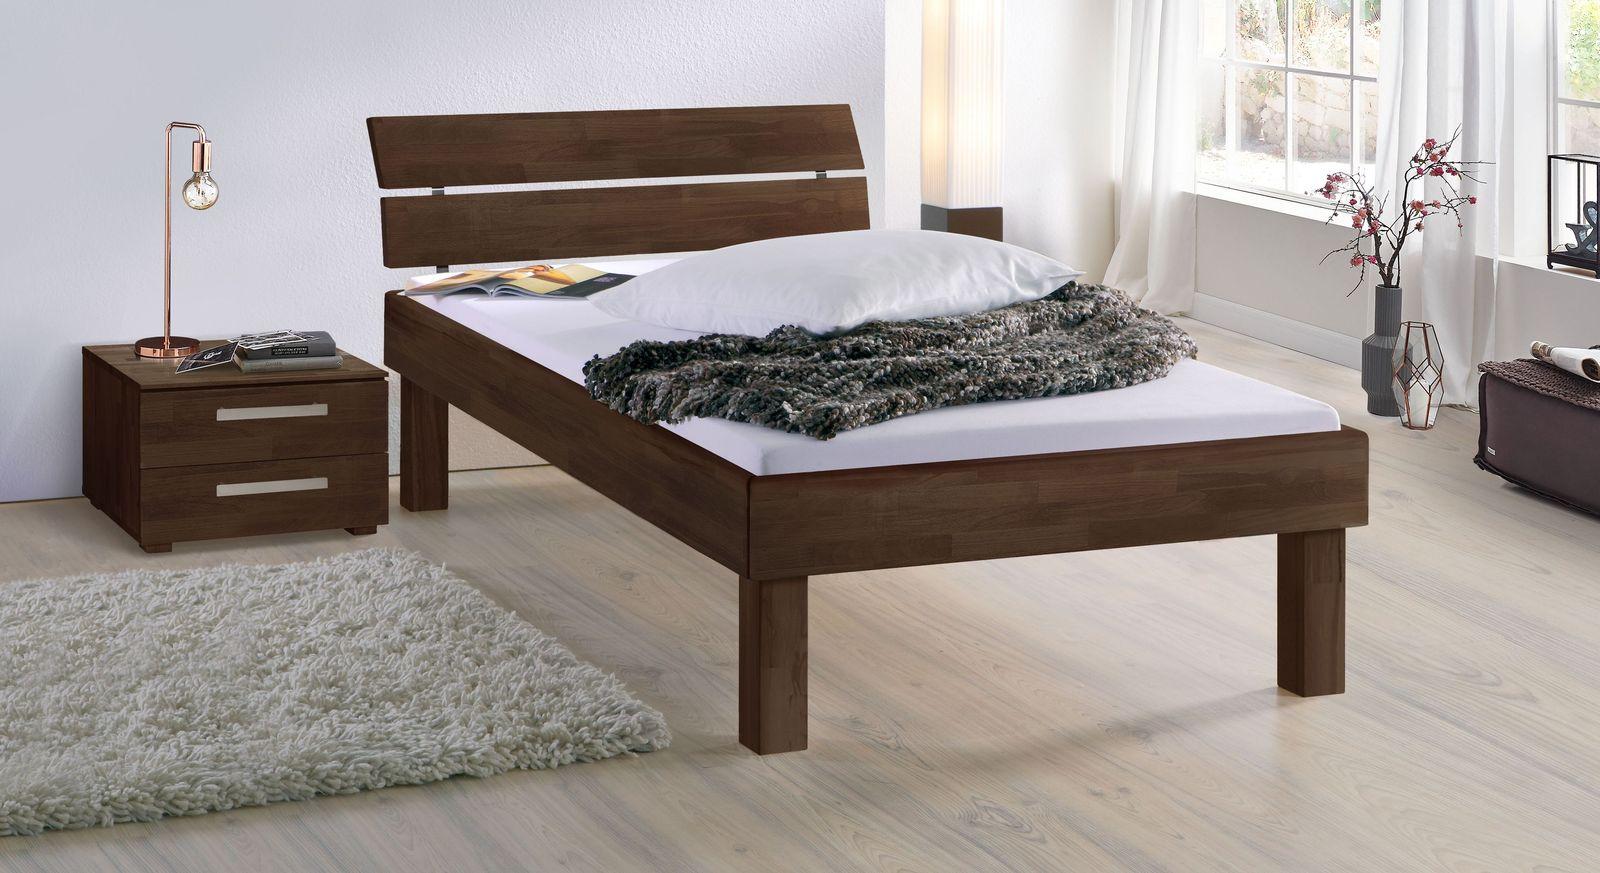 Wengefarbenes Bett Madrid Komfort in 30 cm Höhe